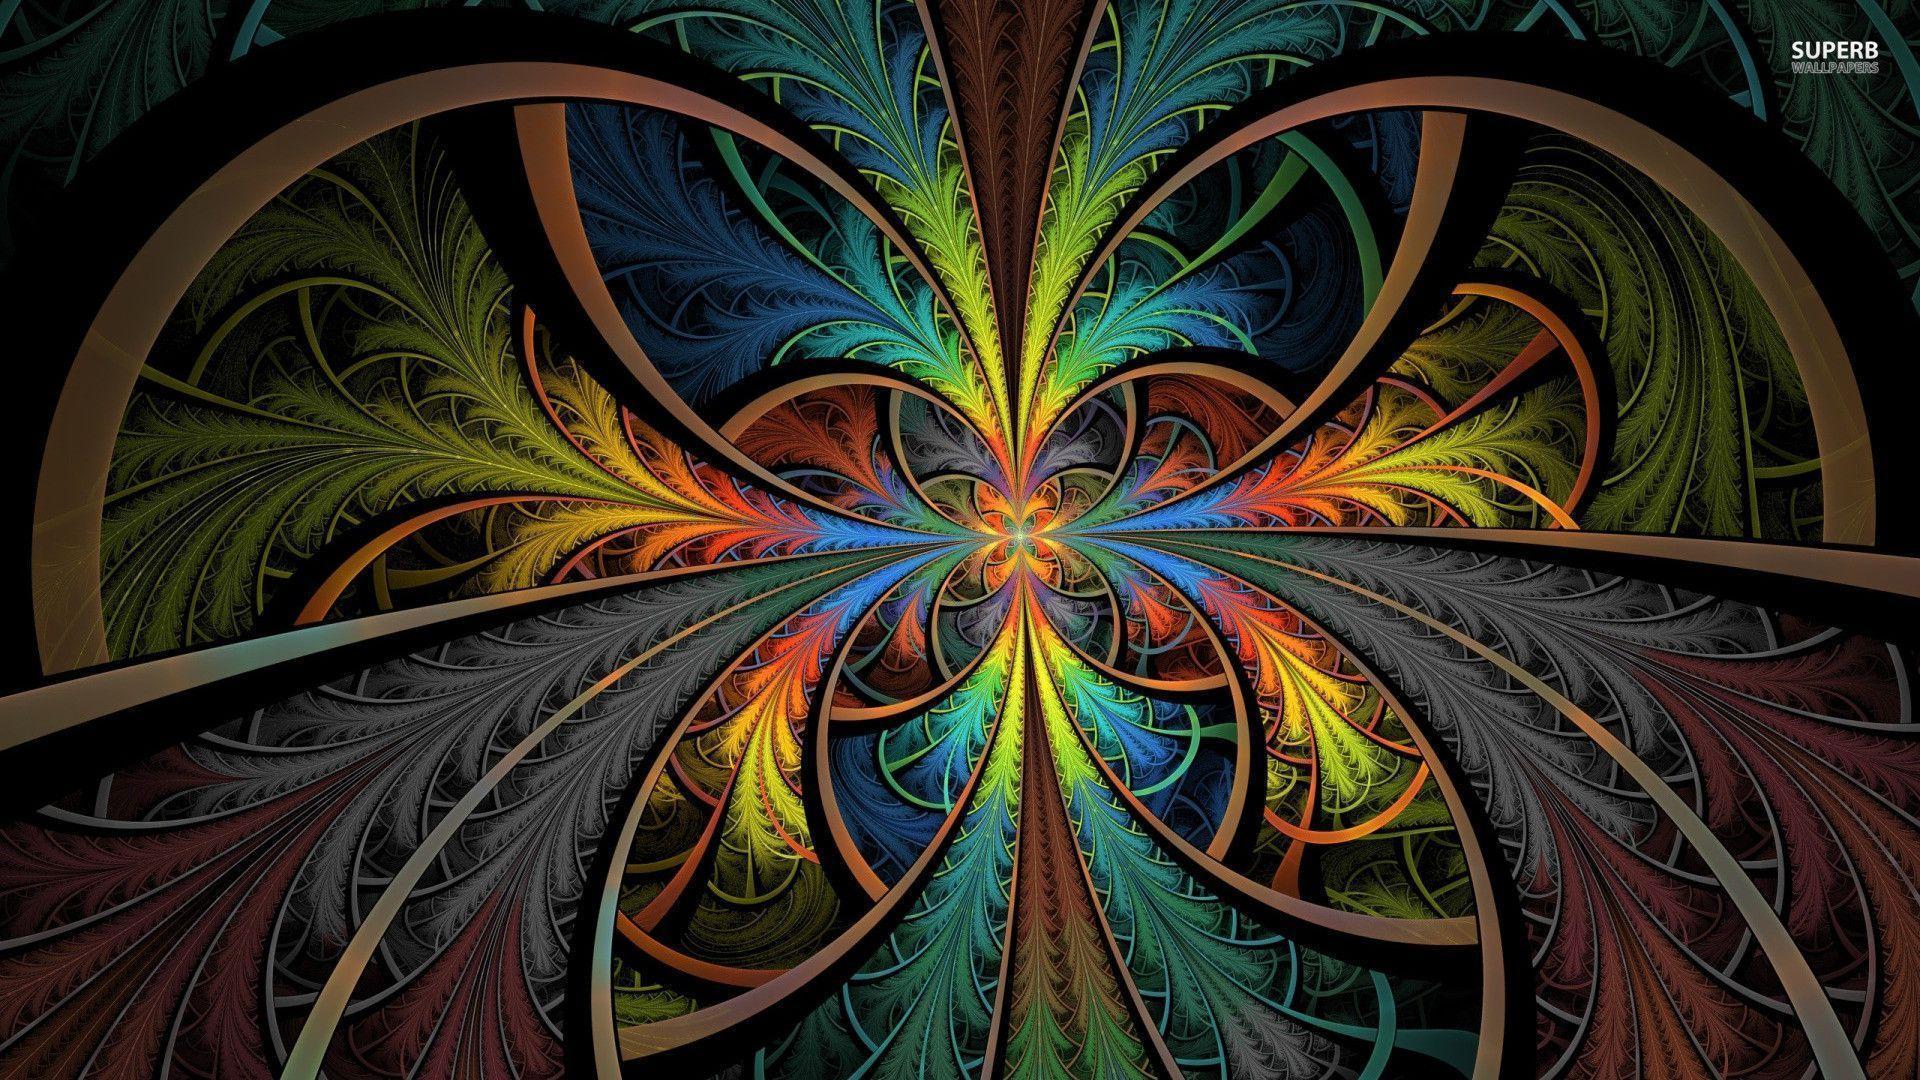 Psychedelic Desktop Backgrounds - Wallpaper Cave